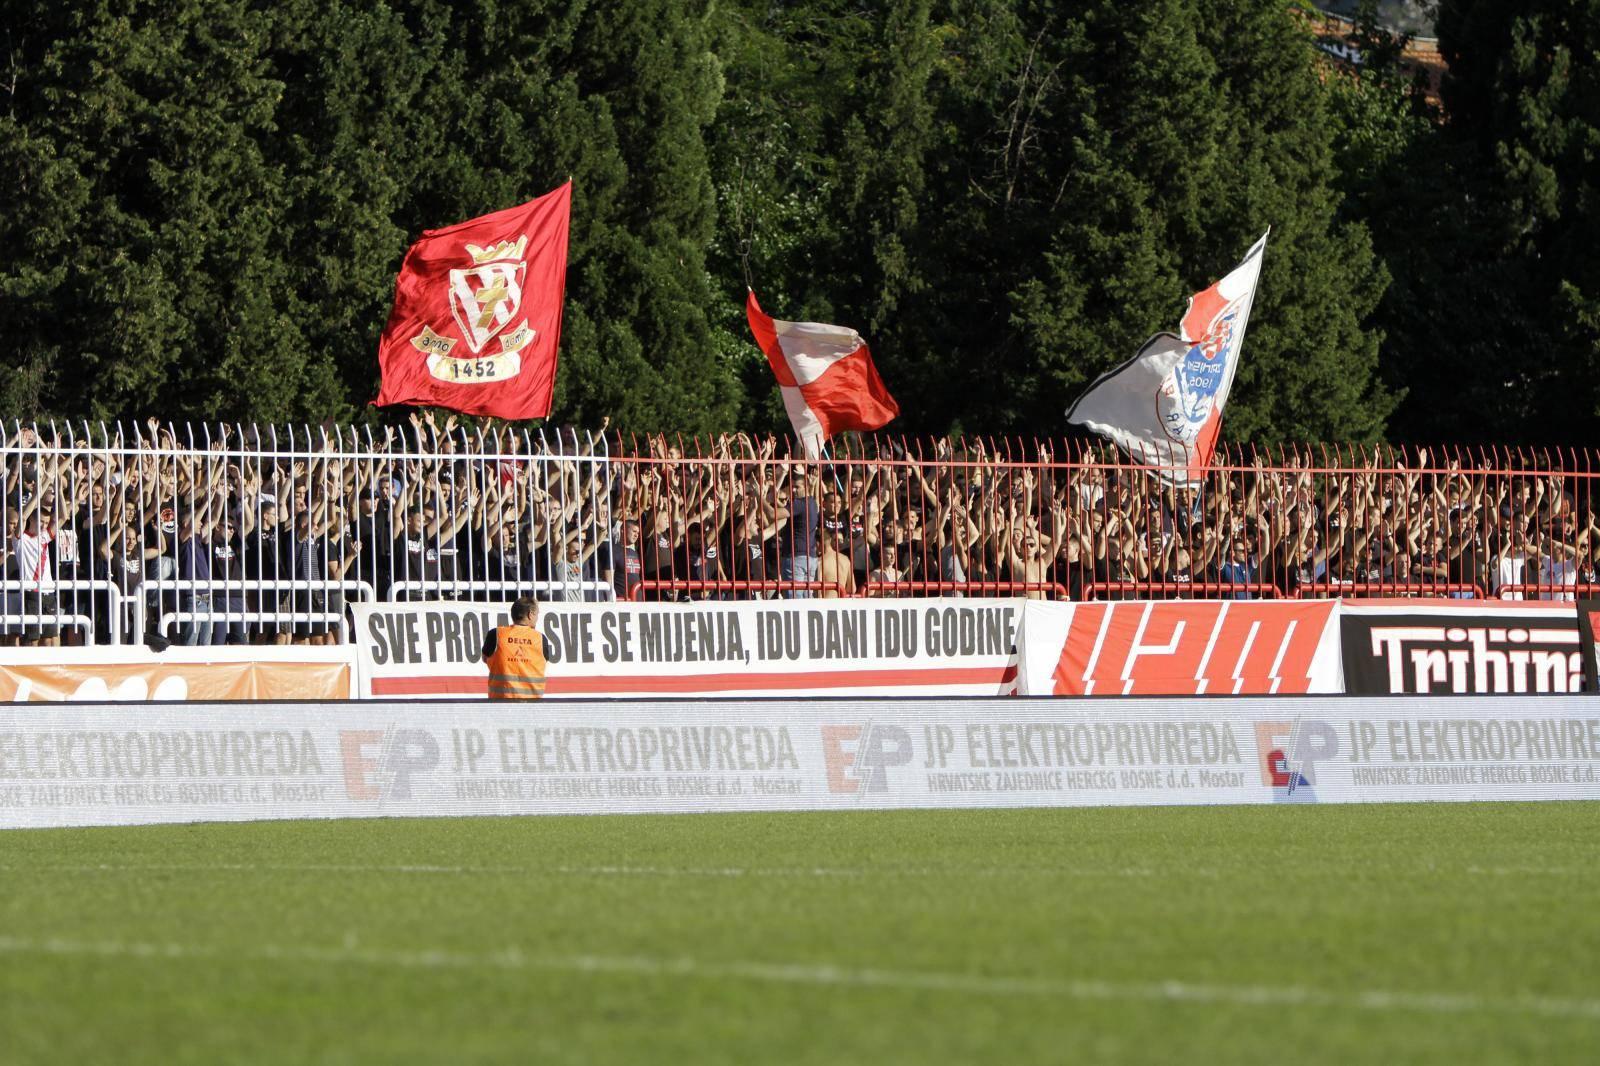 Mostar: Utakmica Premier lige, HŠK Zrinjski Mostar - NK Široki Brijeg